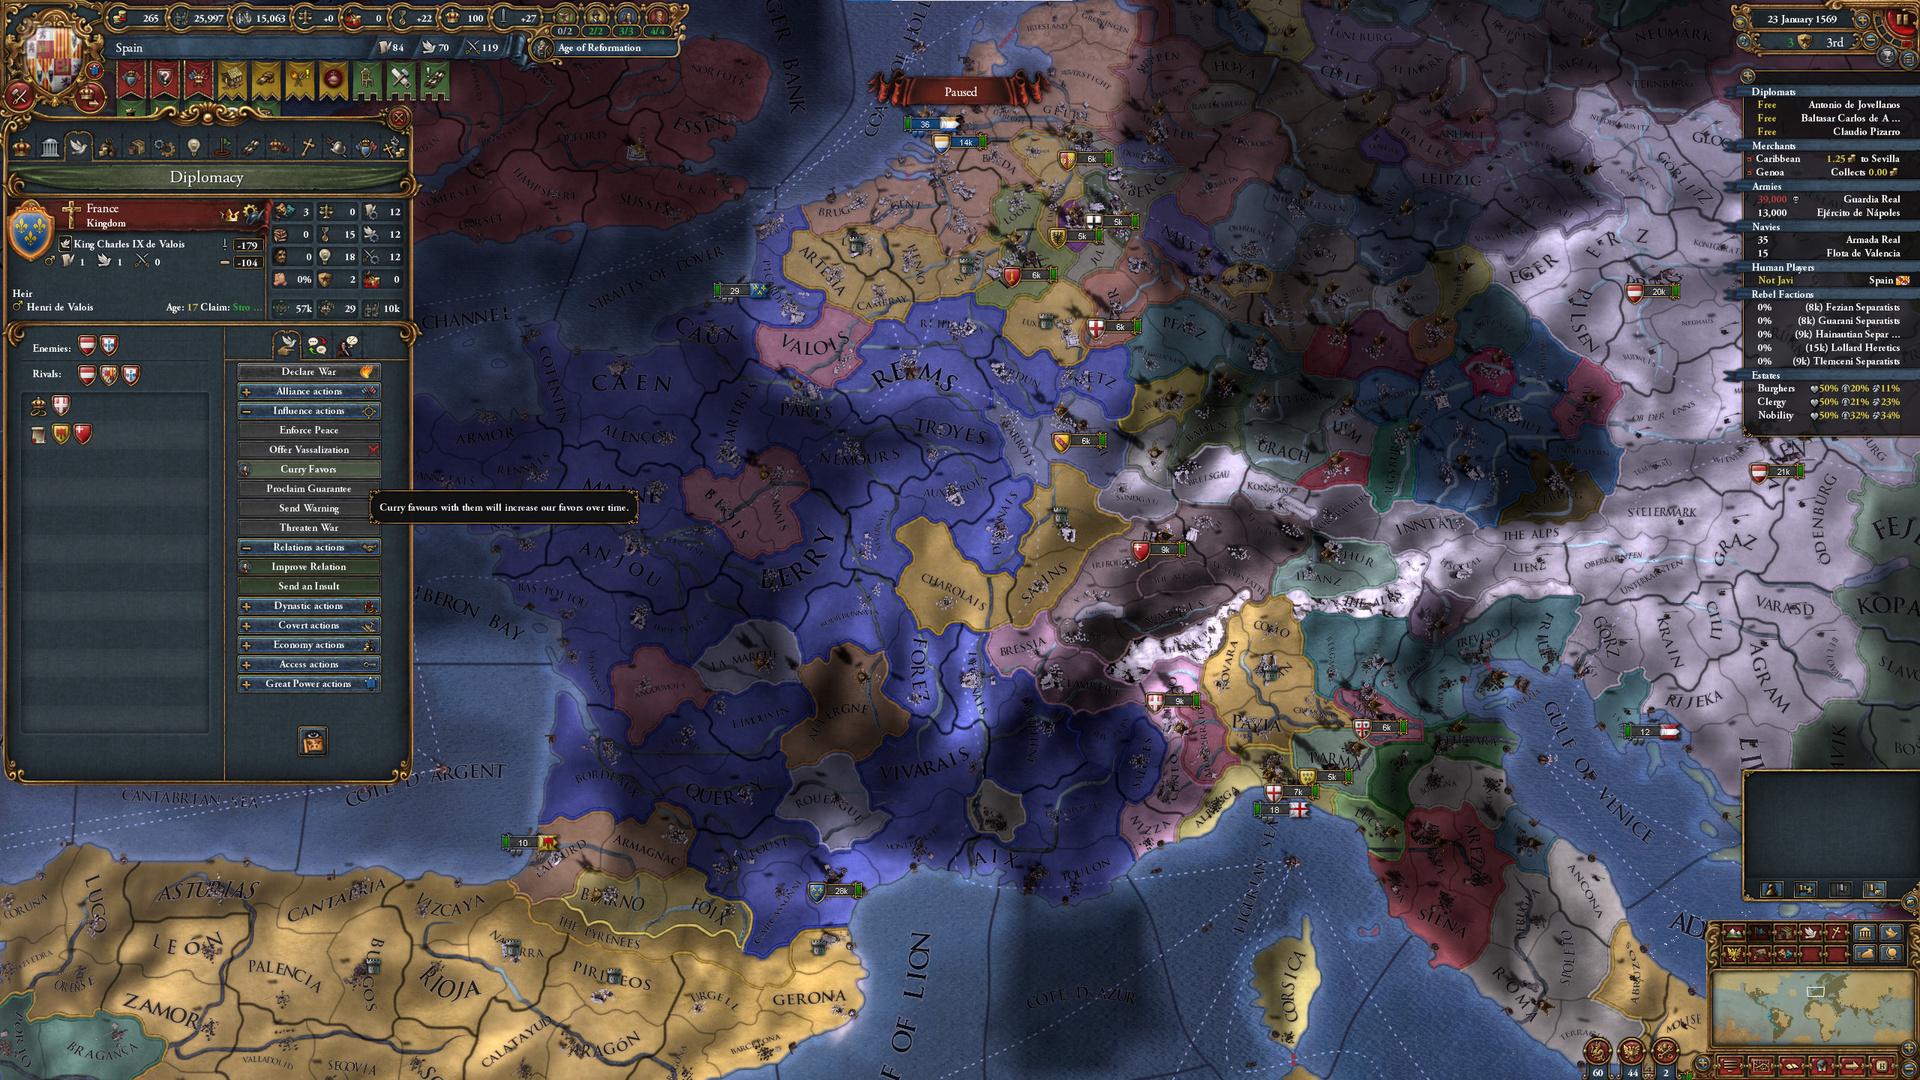 screenshot.europa-universalis-4-leviathan.1920x1080.2021-02-09.4.jpg